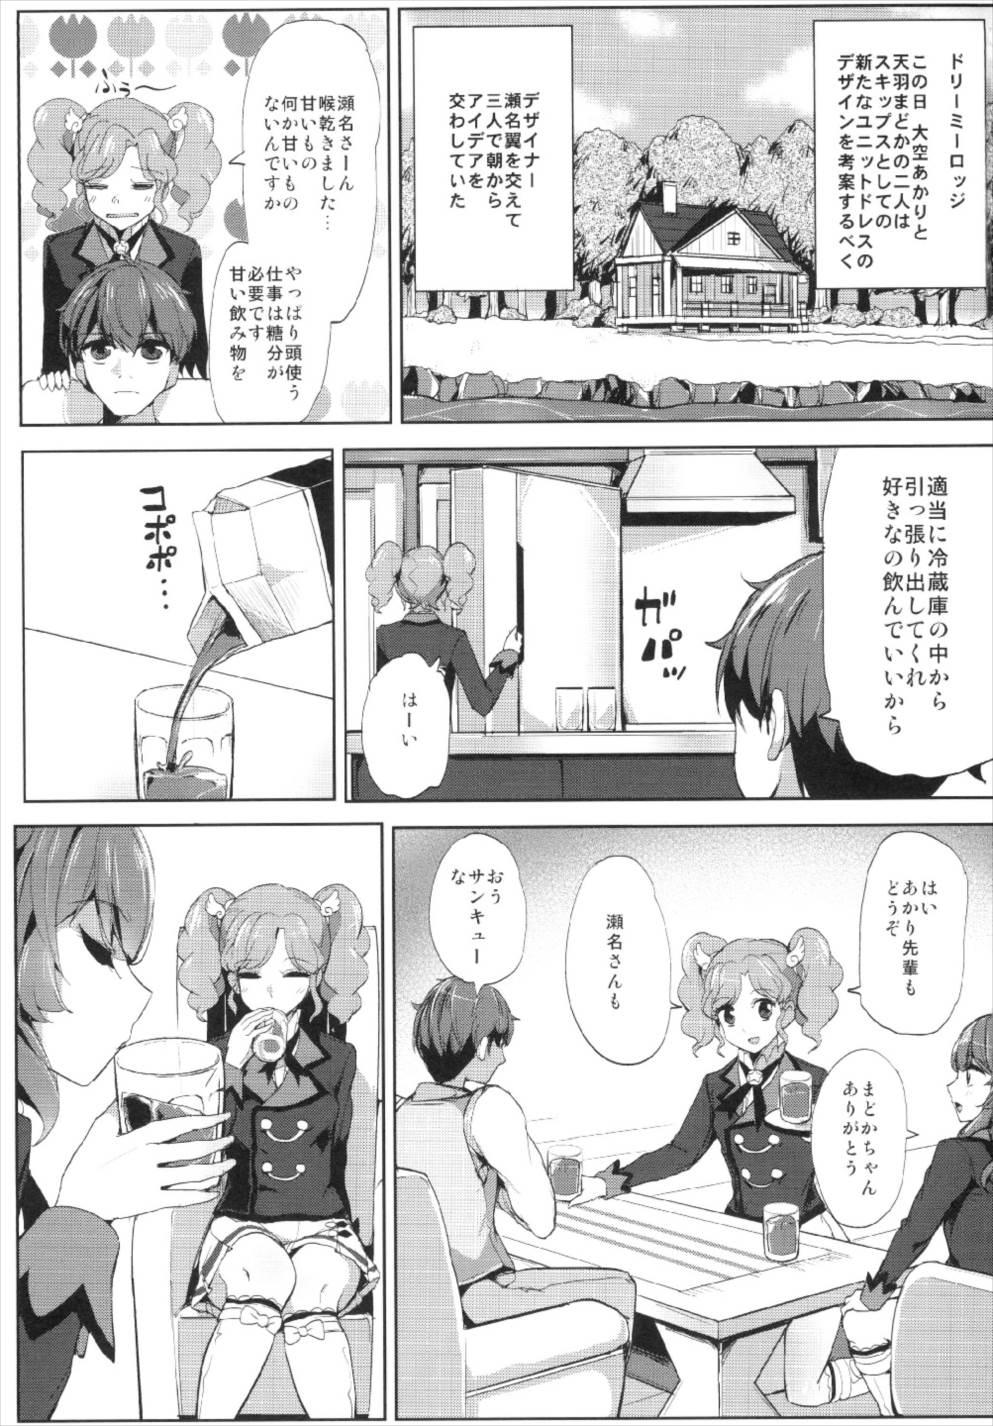 Sena-san Saitte Desu♥ 2